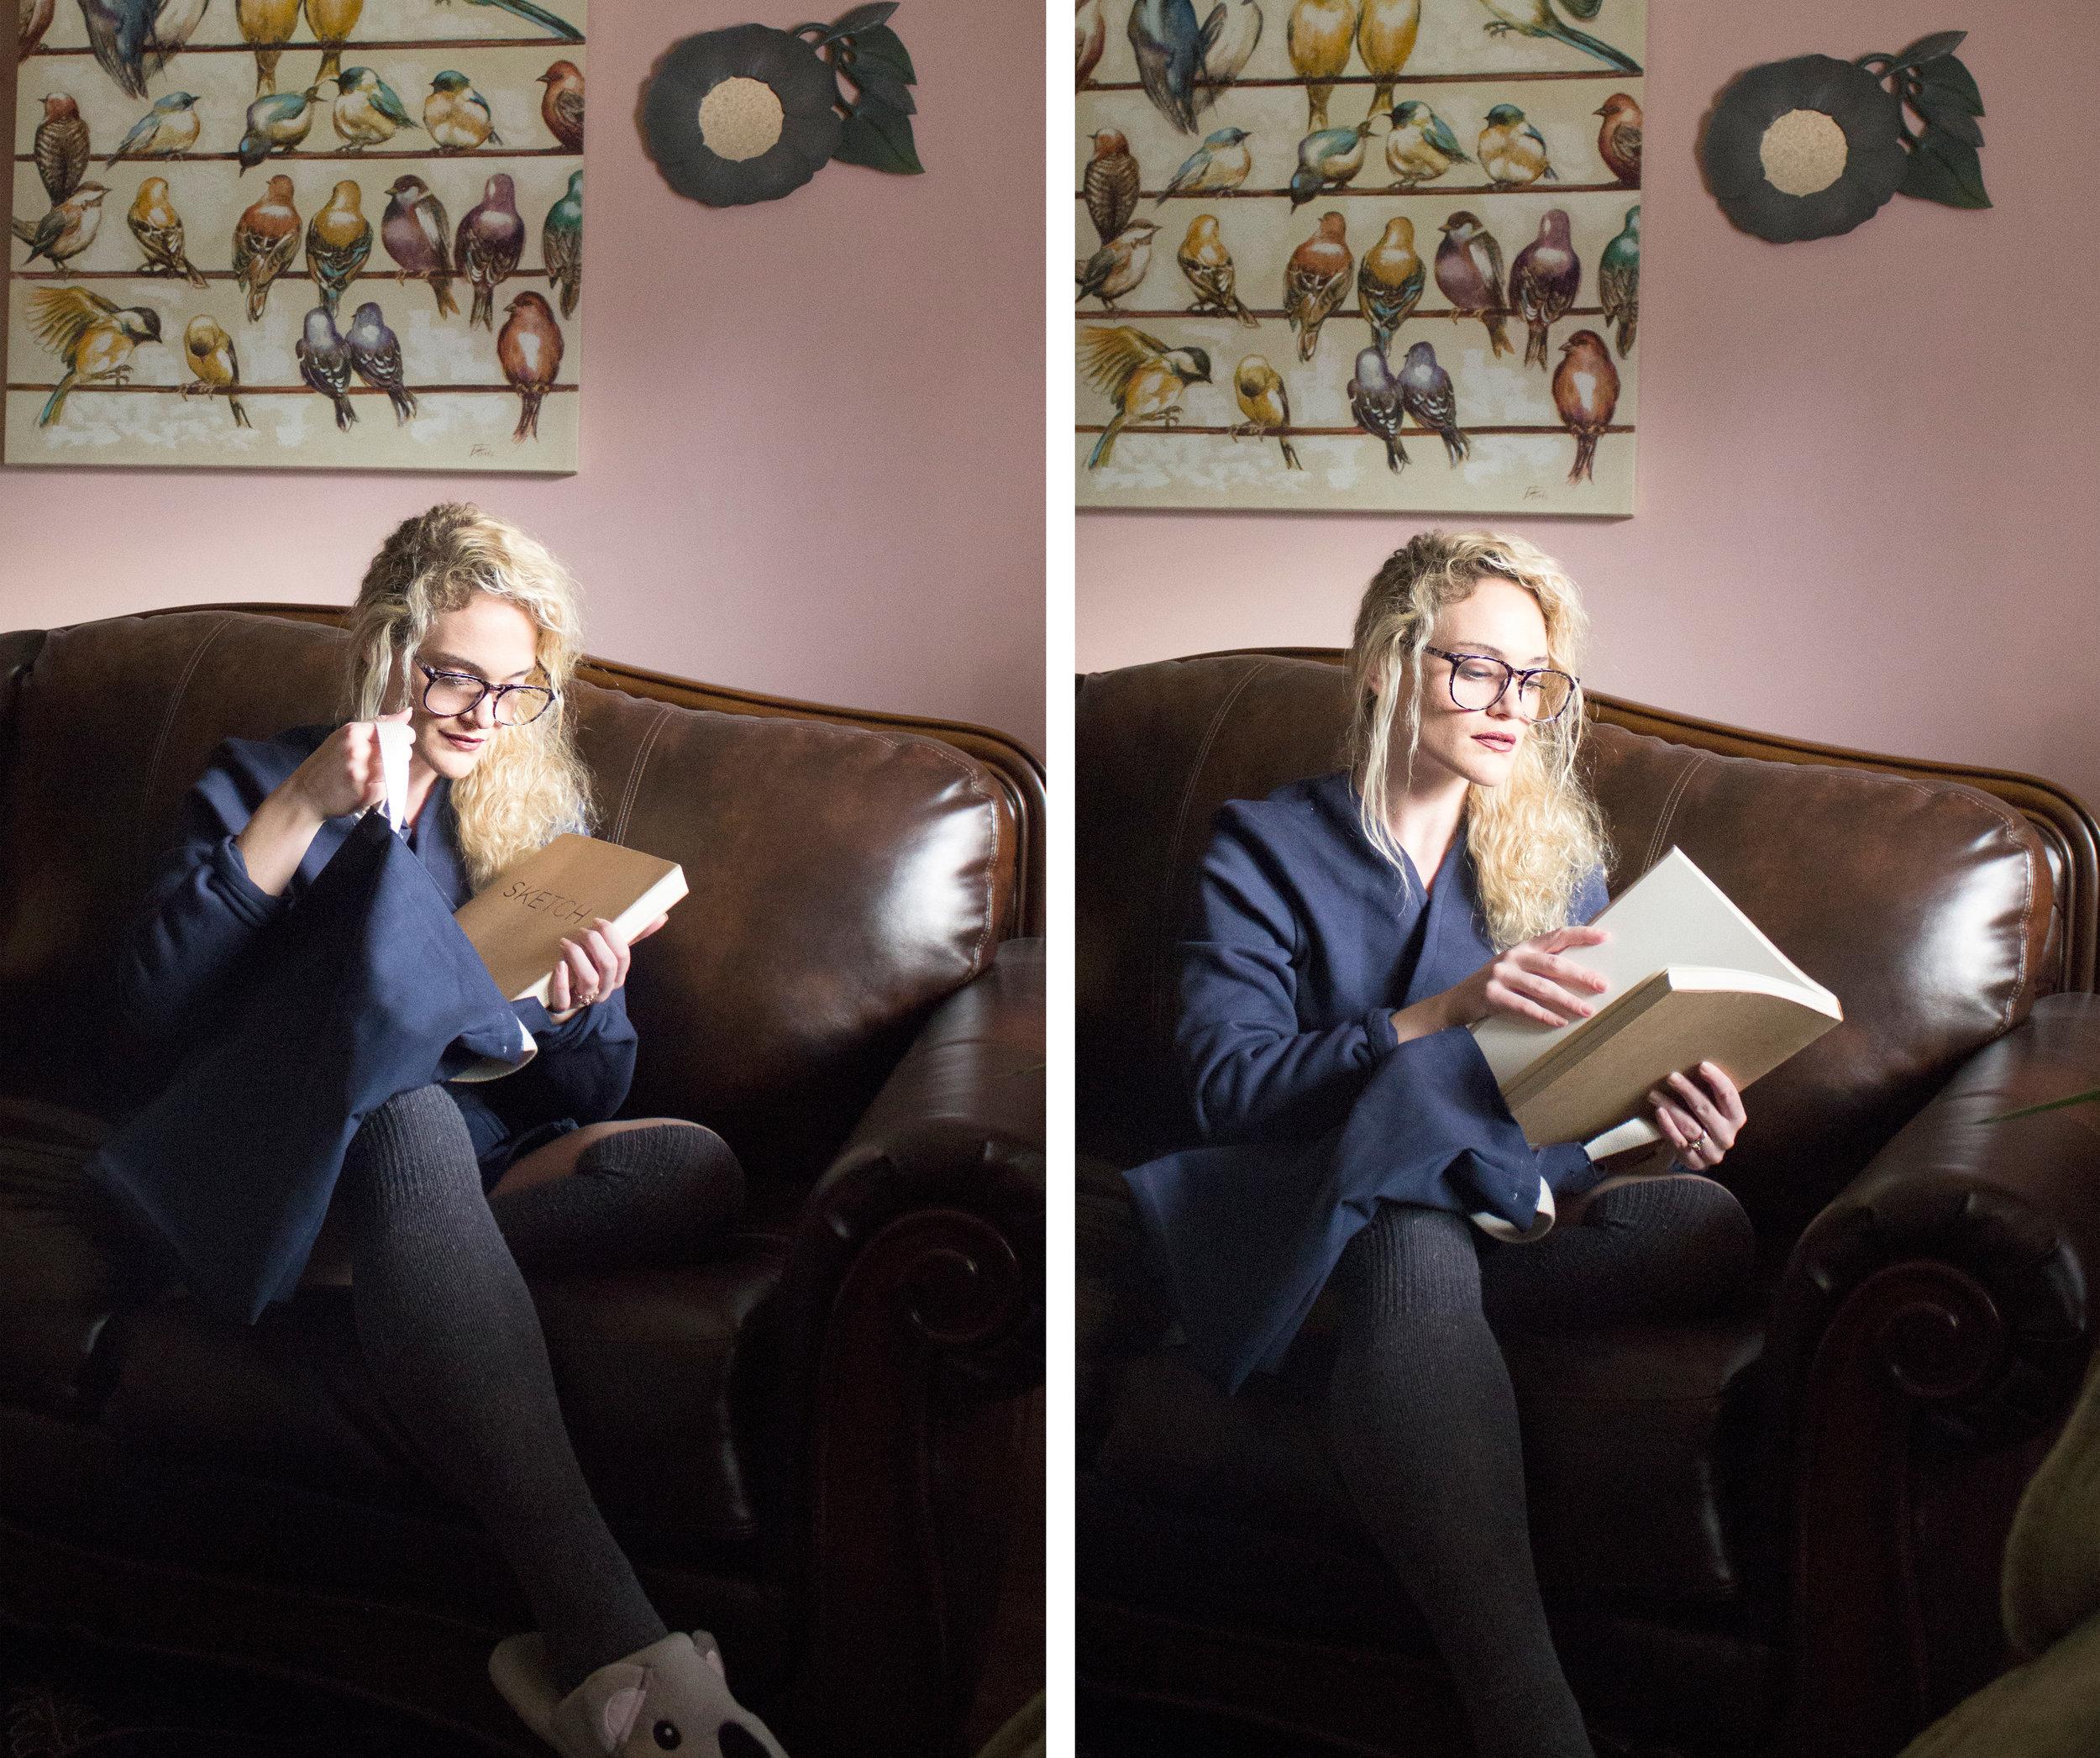 robe  |  canvas duffle  |  glasses  |  socks  |  slippers